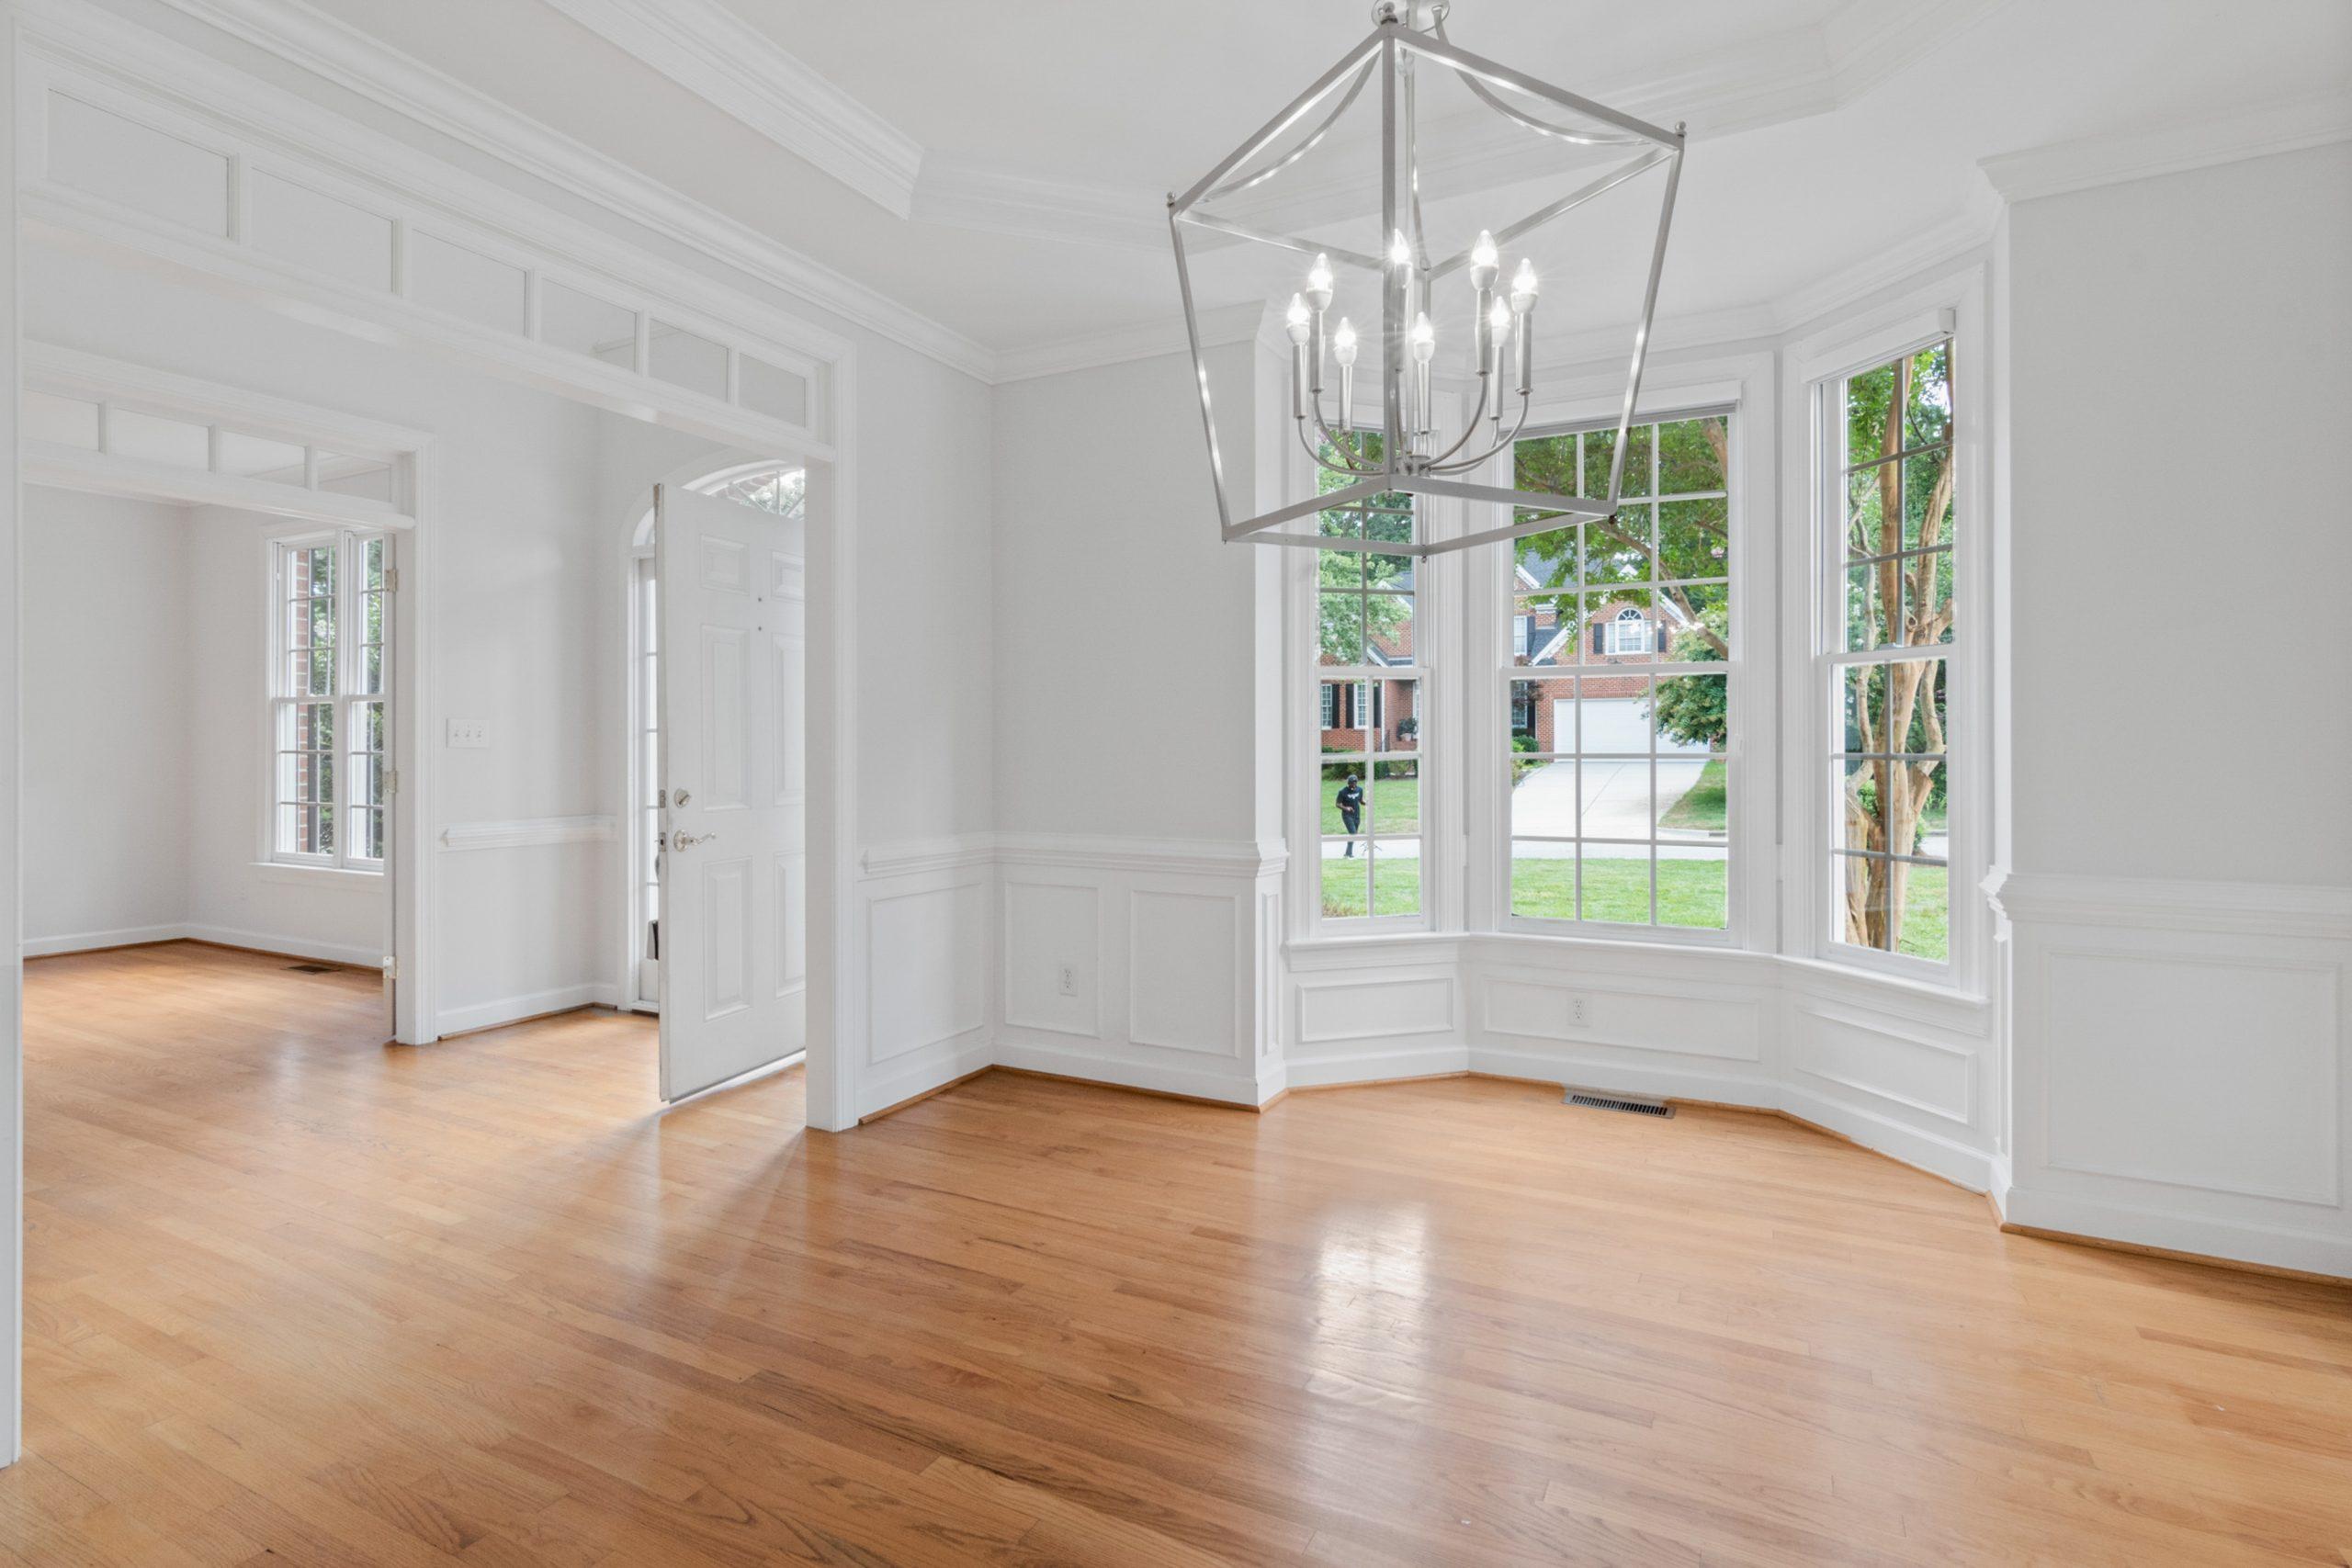 Inside An Empty House